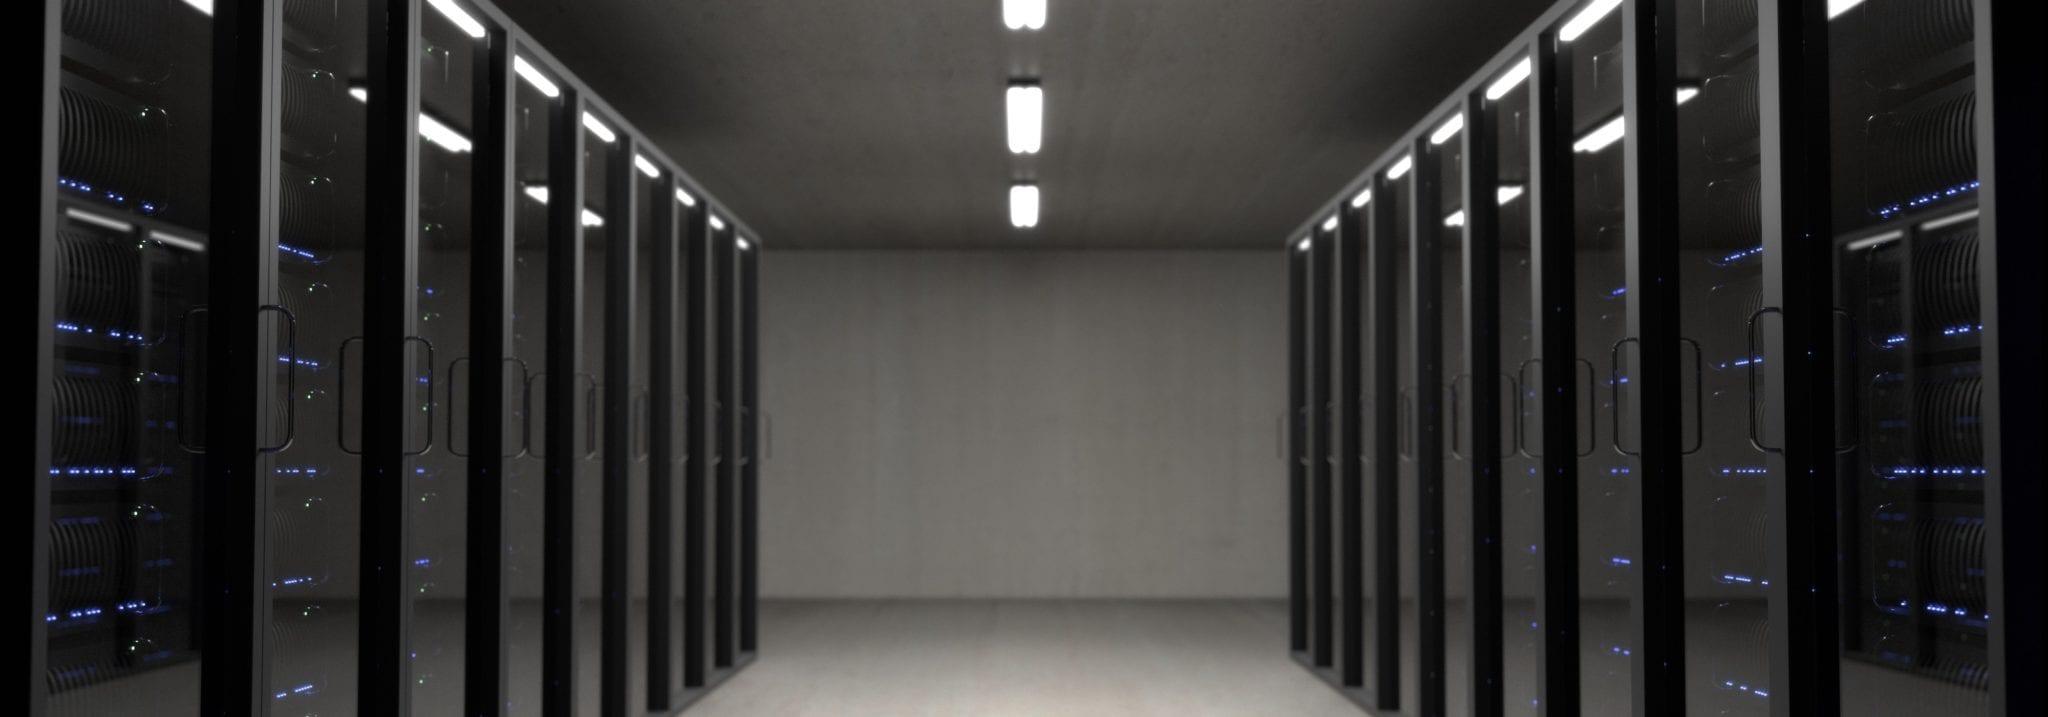 cabinet-data-data-center-325229